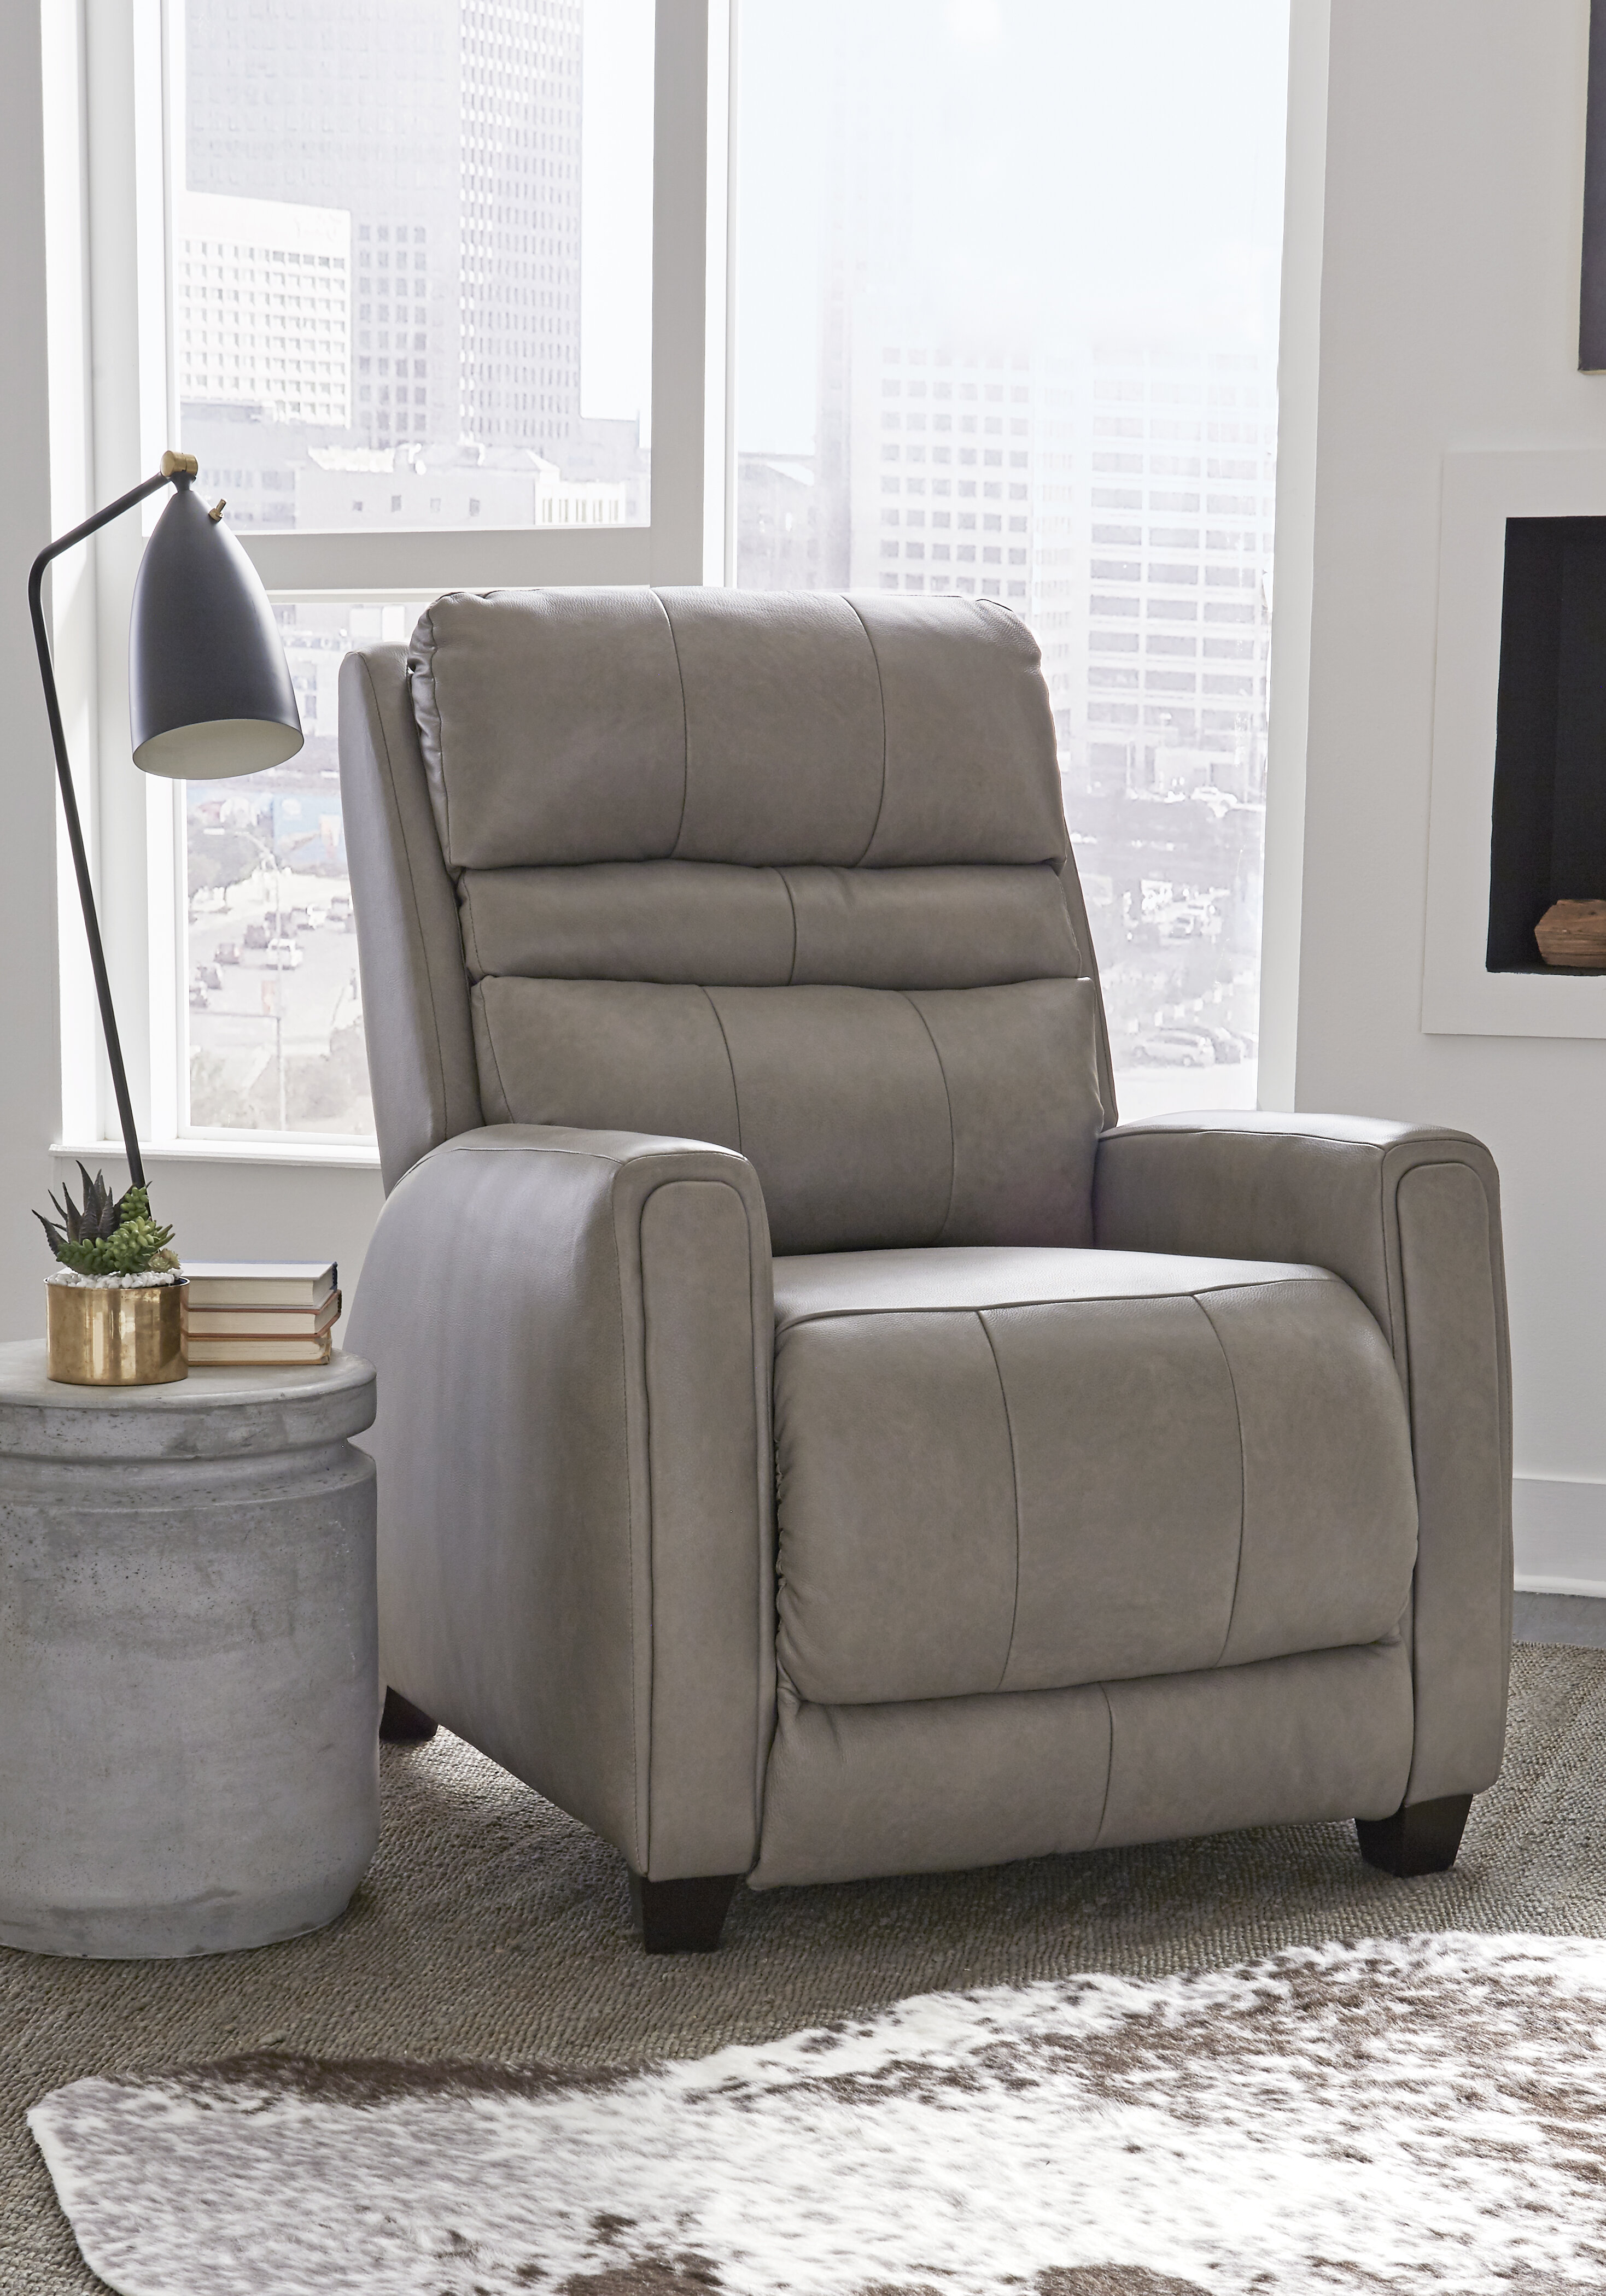 Turbo Socozi Power Heated Massage Chair